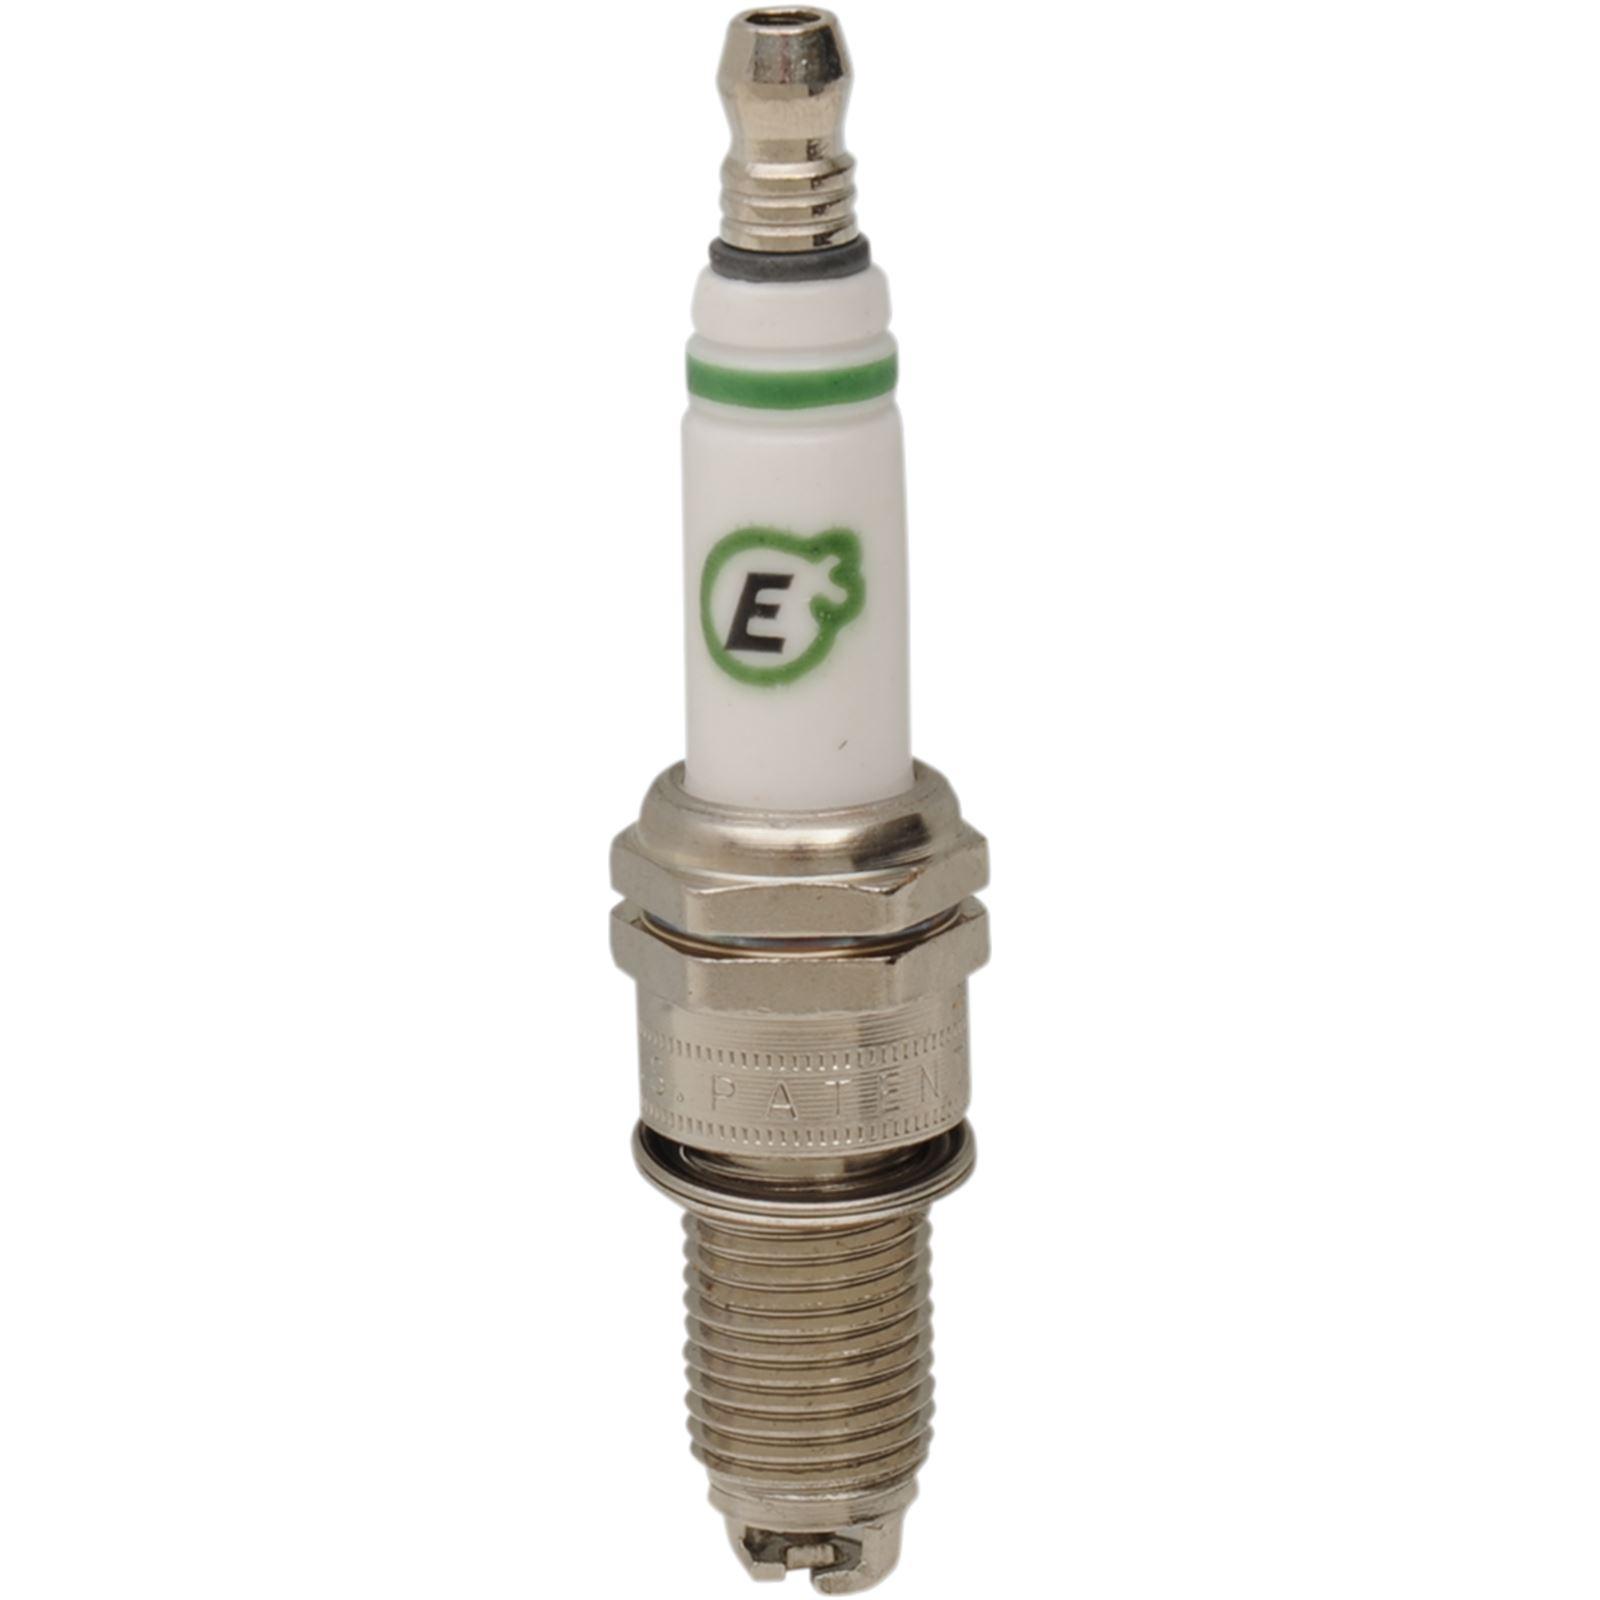 Powermadd E3 Spark Plug - 36